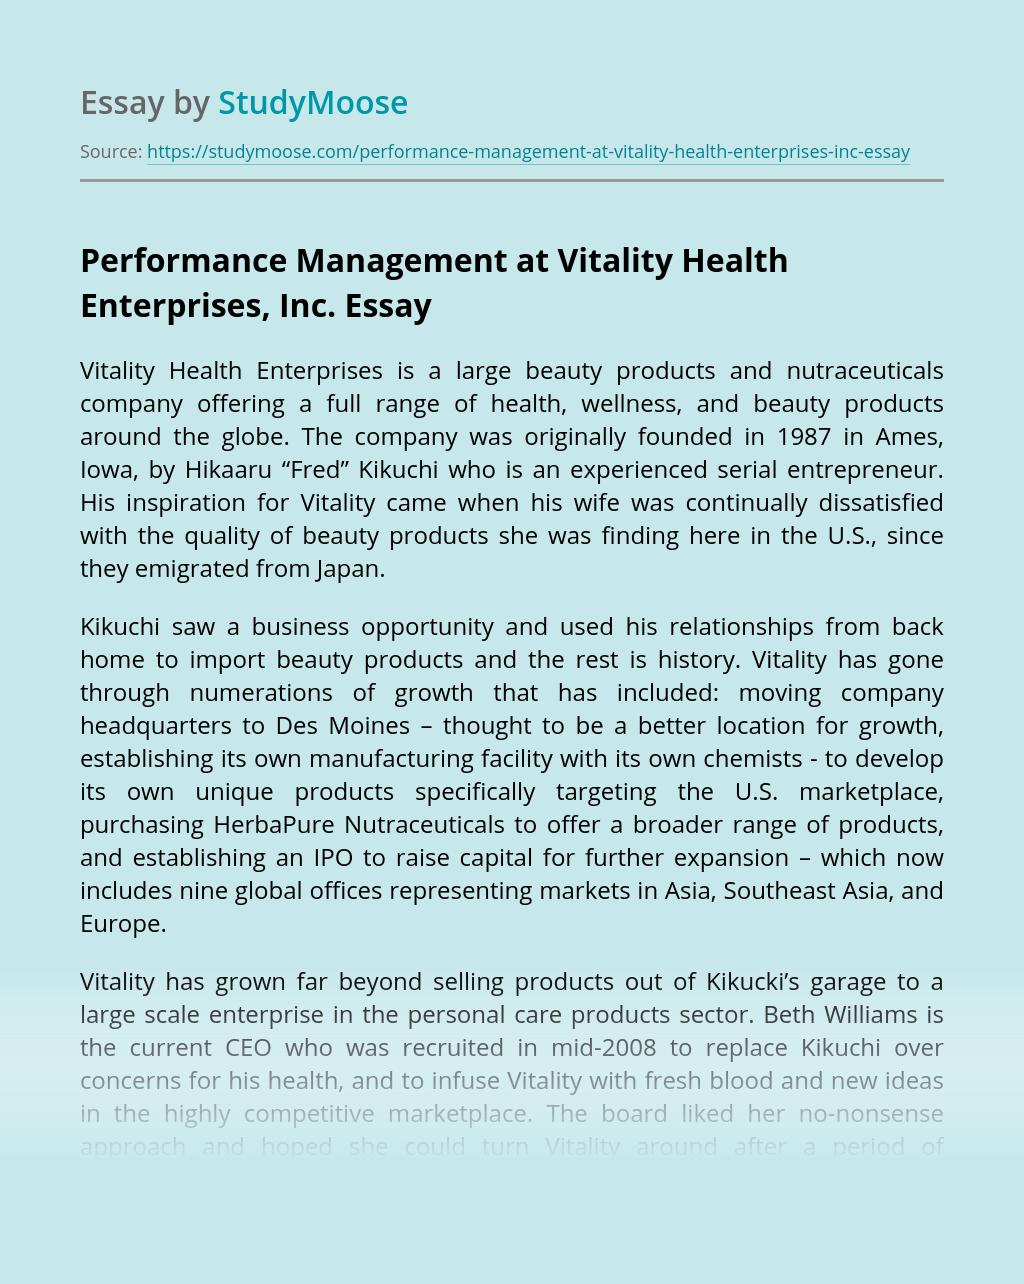 Performance Management at Vitality Health Enterprises, Inc.